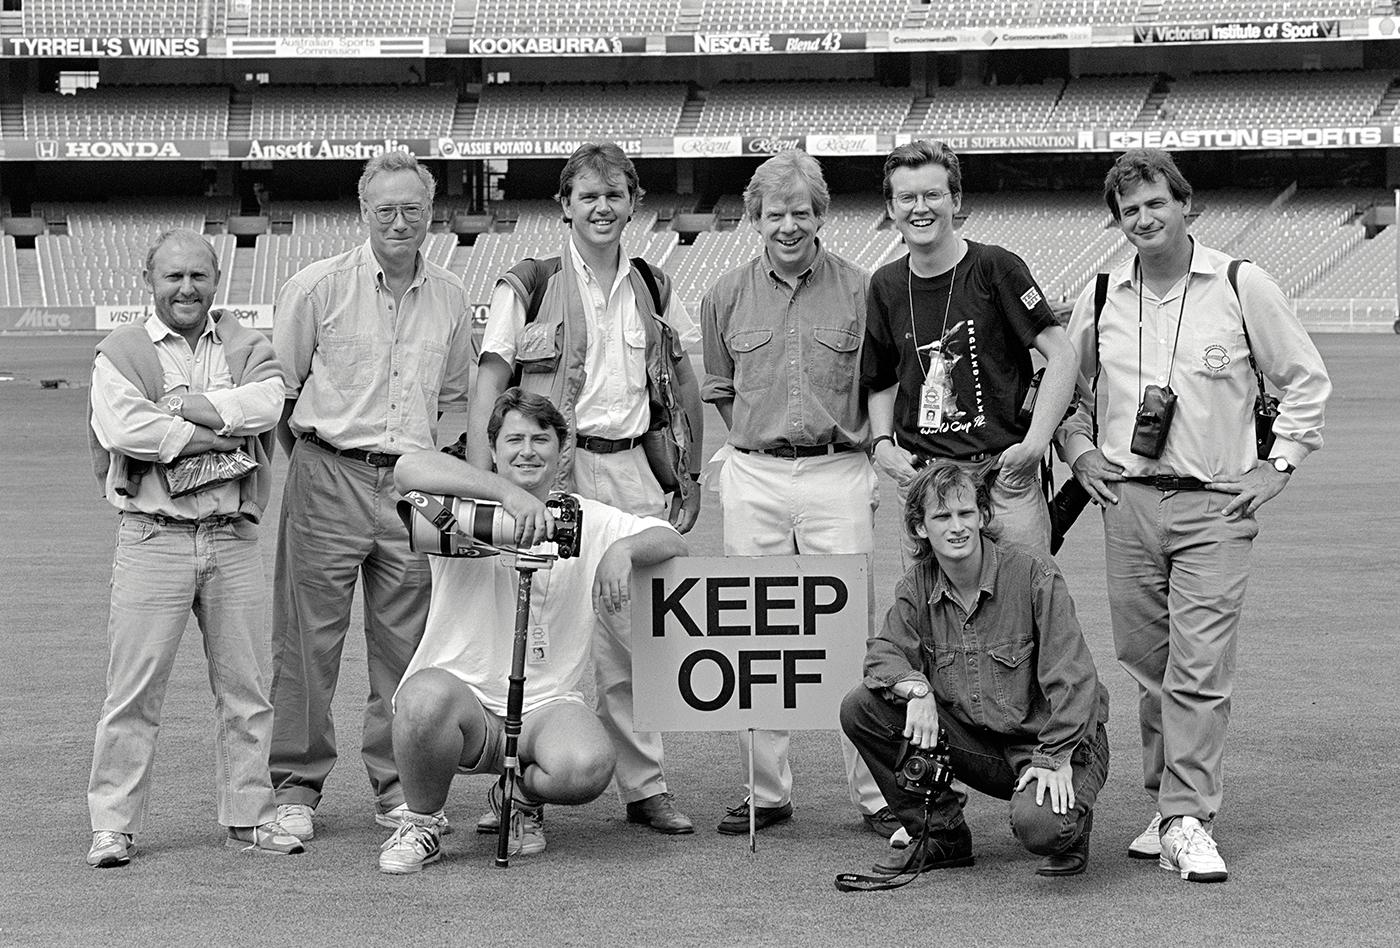 Cricket photographers (standing, from left) Joe Mann, Patrick Eagar, Graham Morris, Brendan Monks, Tom Jenkins, Adrian Murrell, (front row) Ben Radford and Graham Chadwick before the World Cup final at the MCG